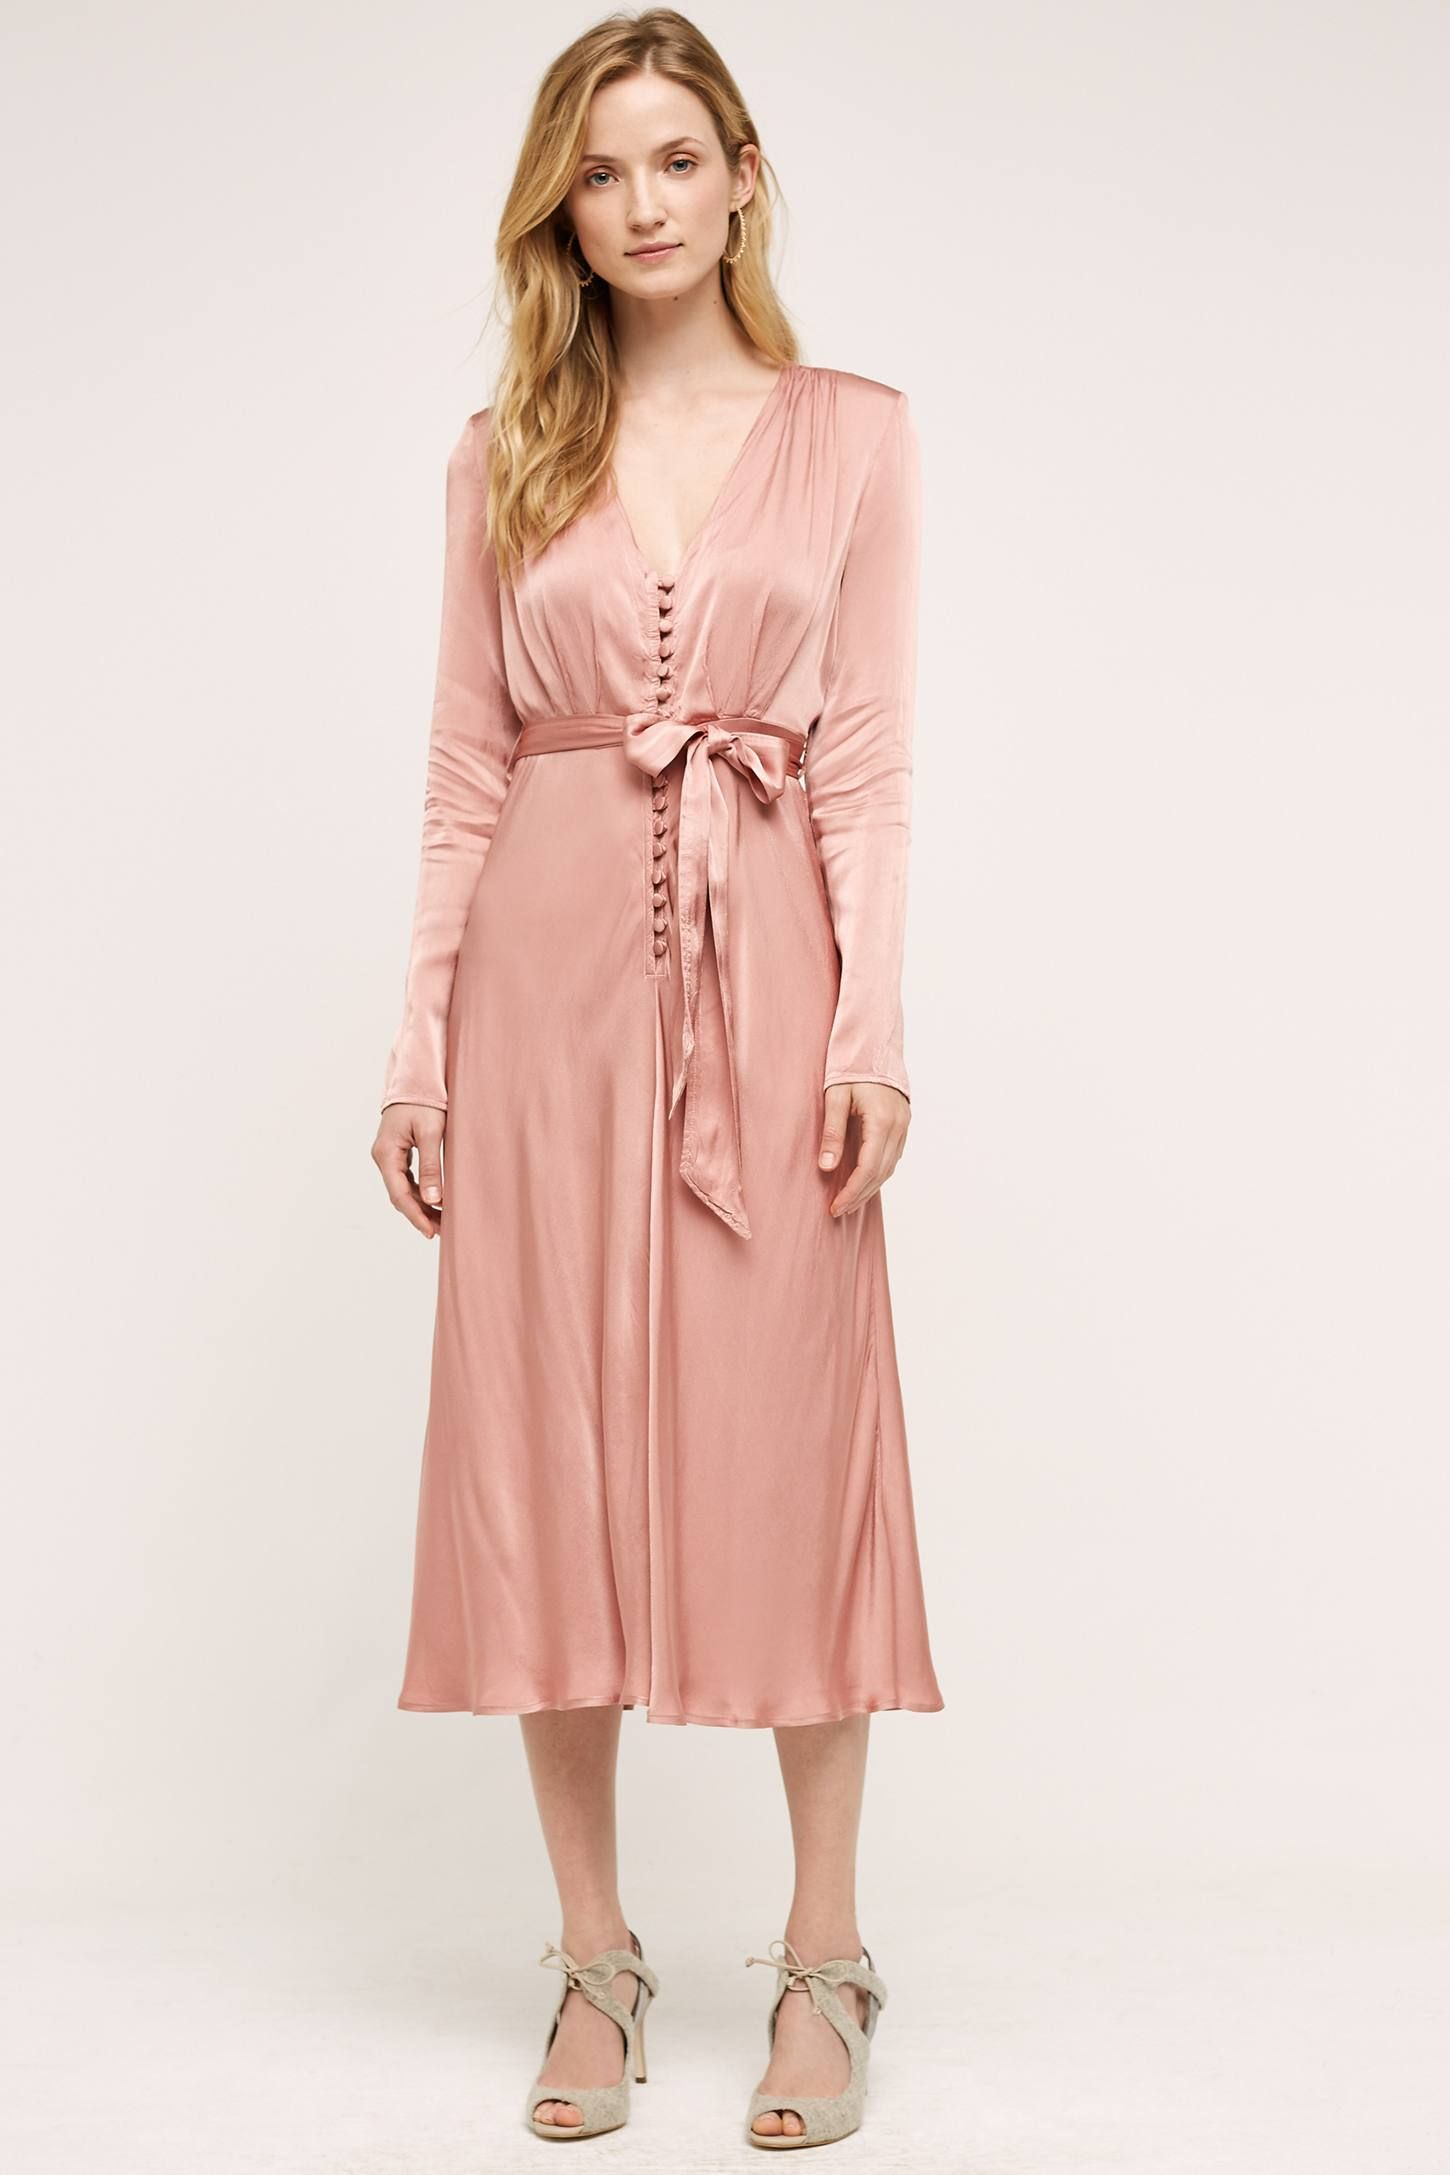 Rose Dawn Dress | Moda estilo y Estilo